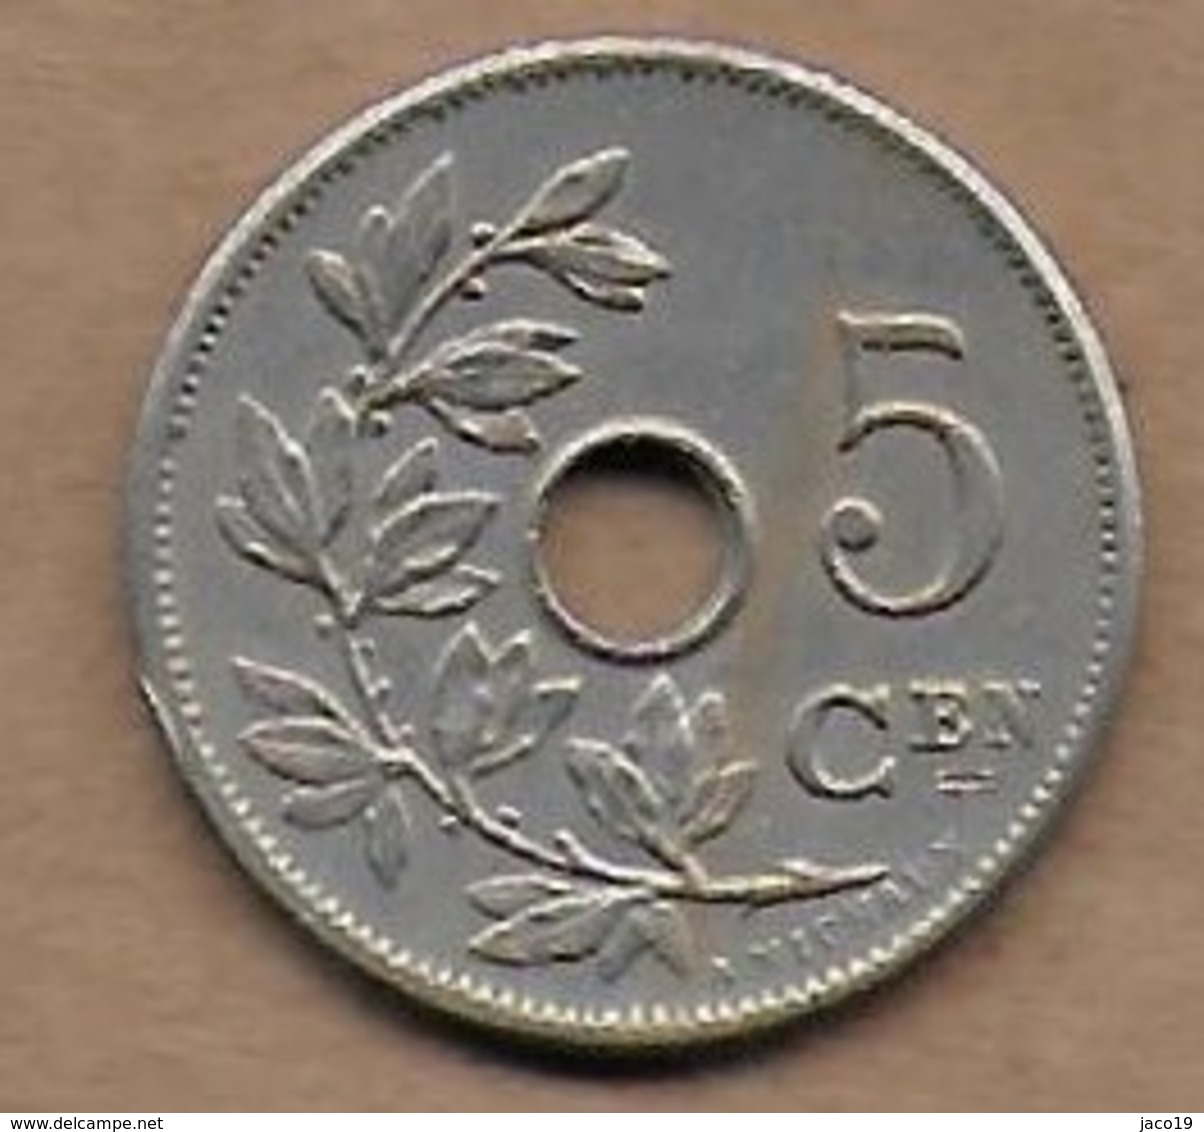 5 Centimes 1905 FL - 1865-1909: Leopold II